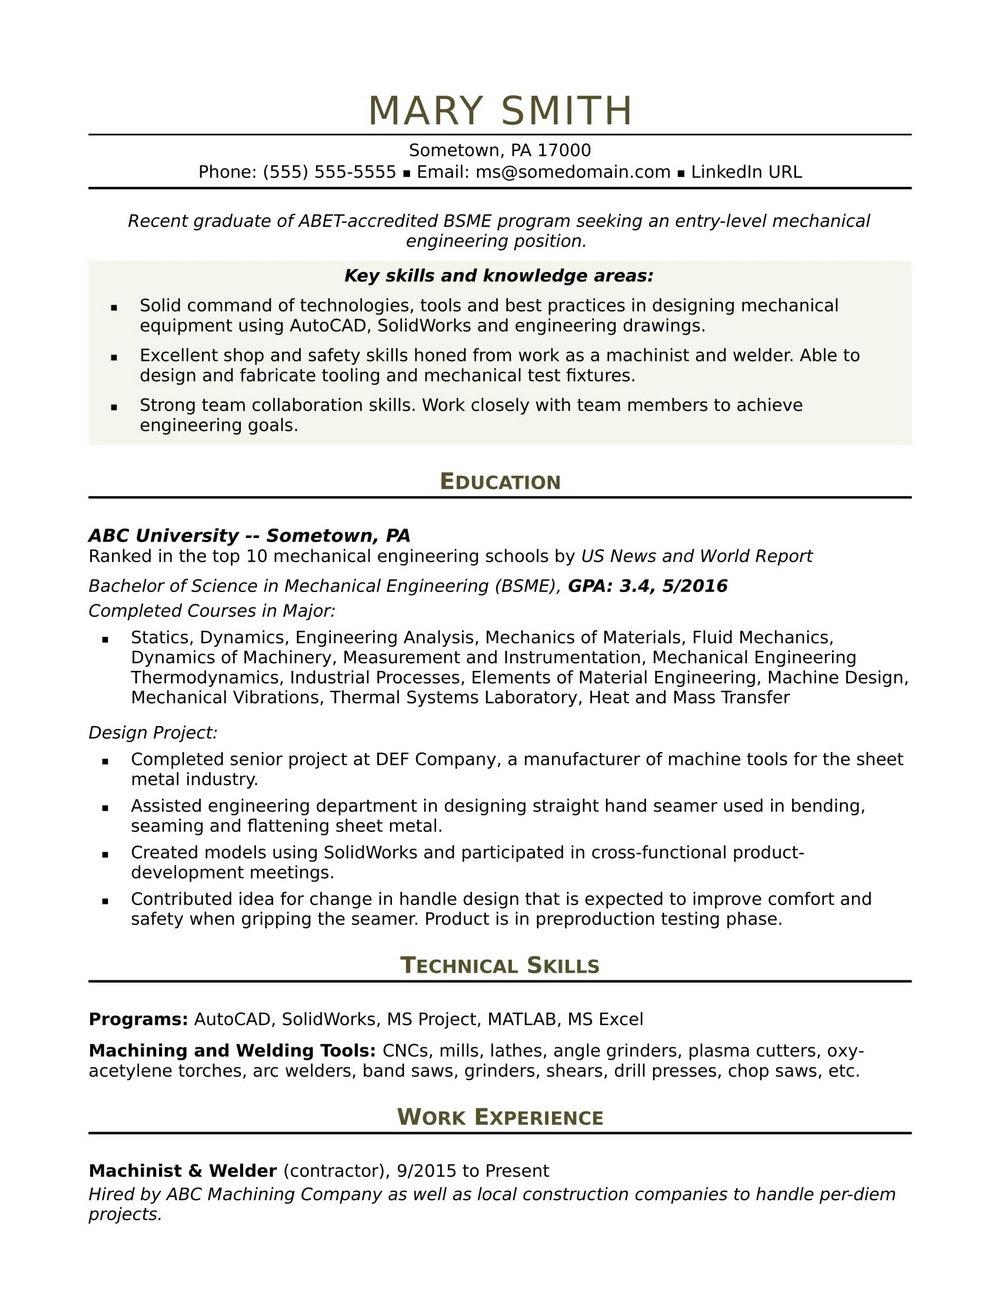 Sample Of Resume For Engineering Jobs